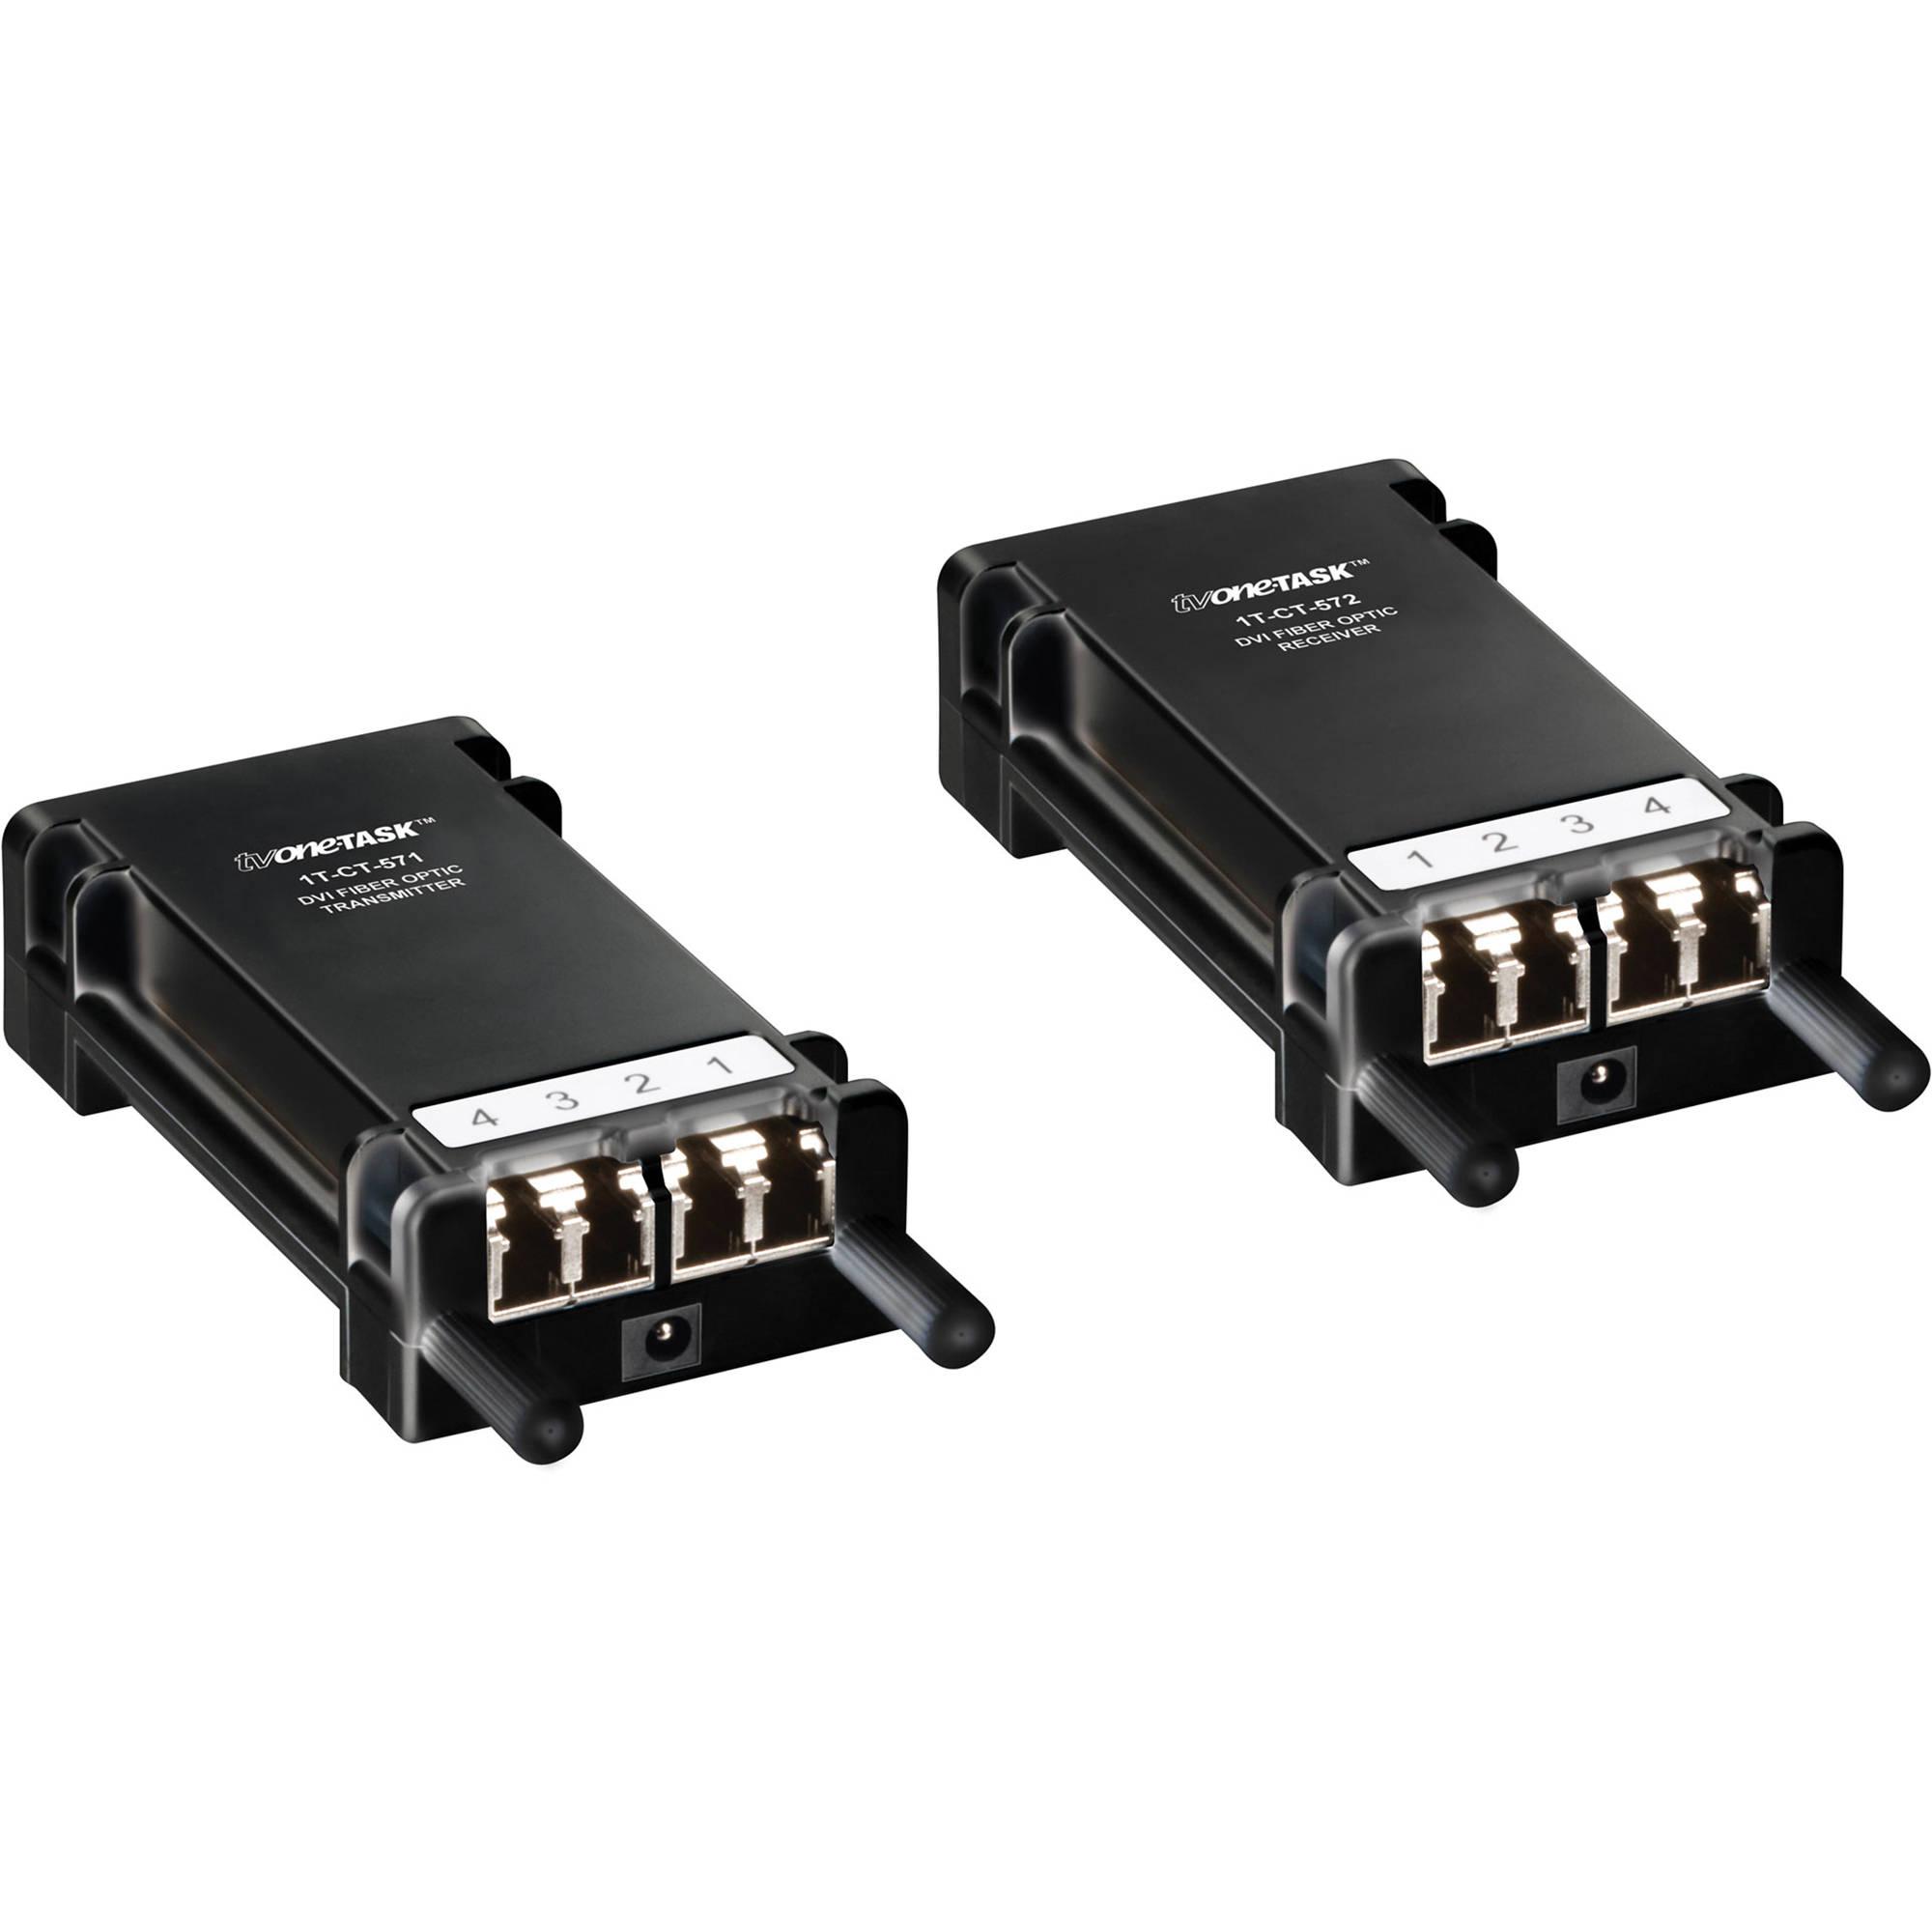 Tv One 1t Ct 570 Dvi Fiber Optic Extender Bh Photo Optics Integrated Circuits Images Of